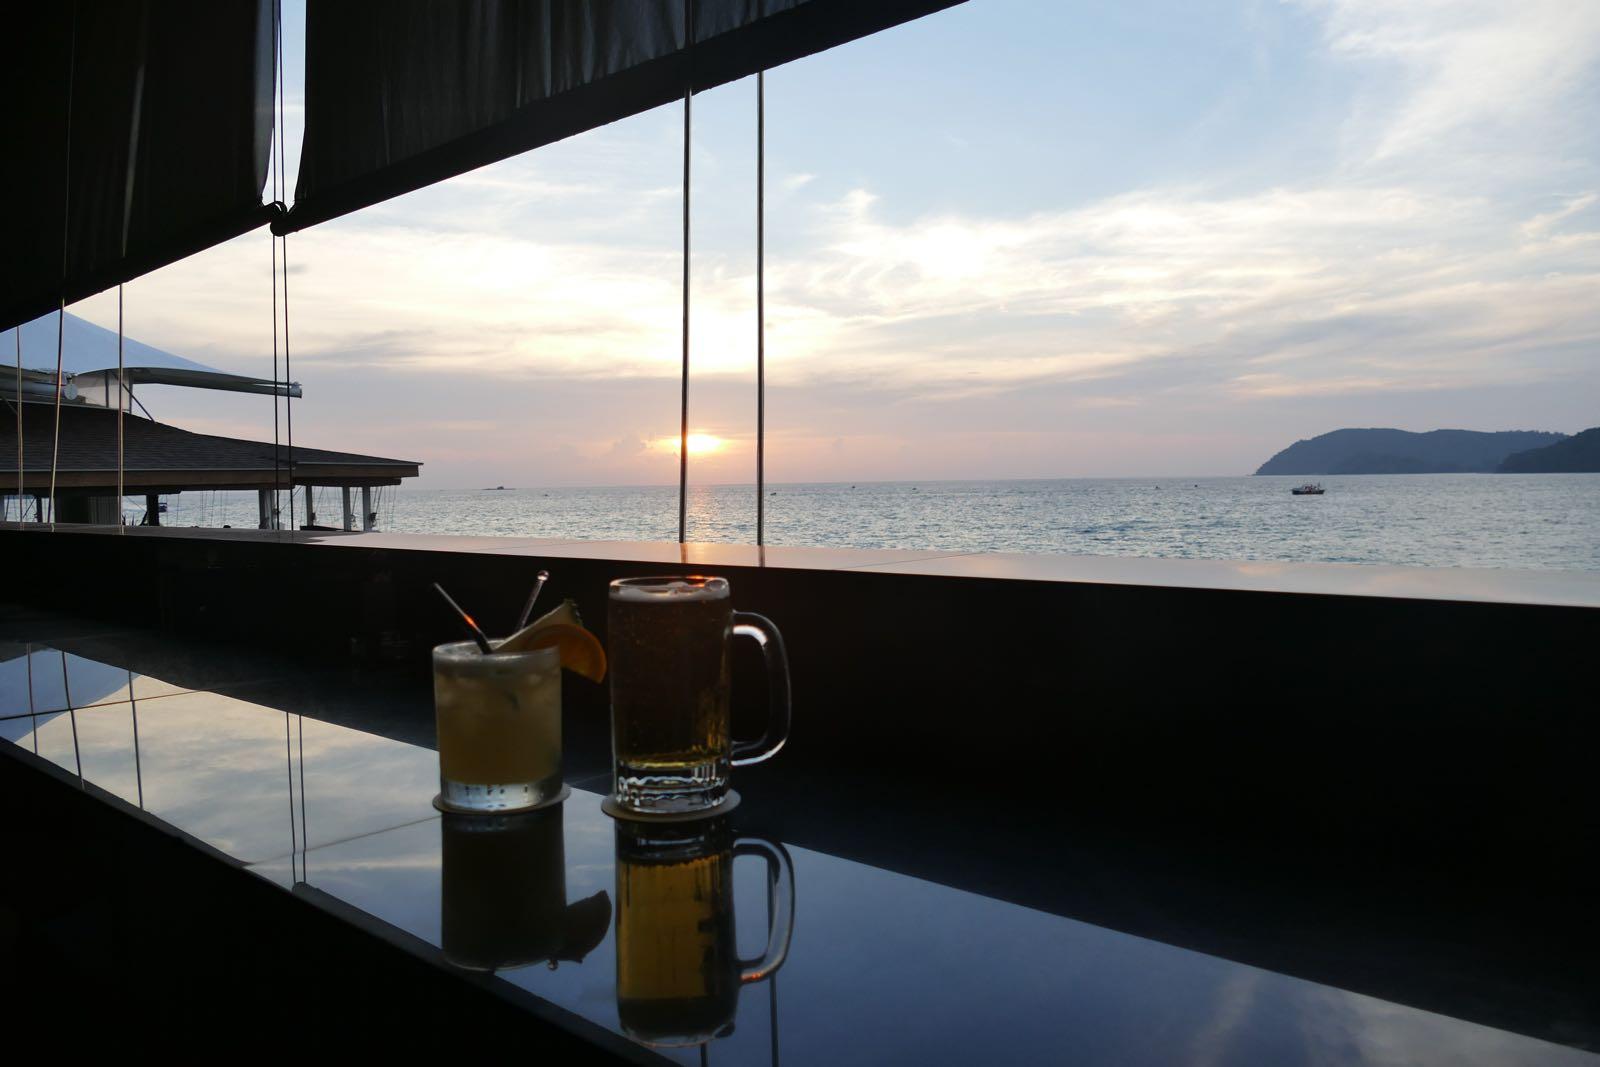 Sonnenuntergang beim The Cliff, Langkawi